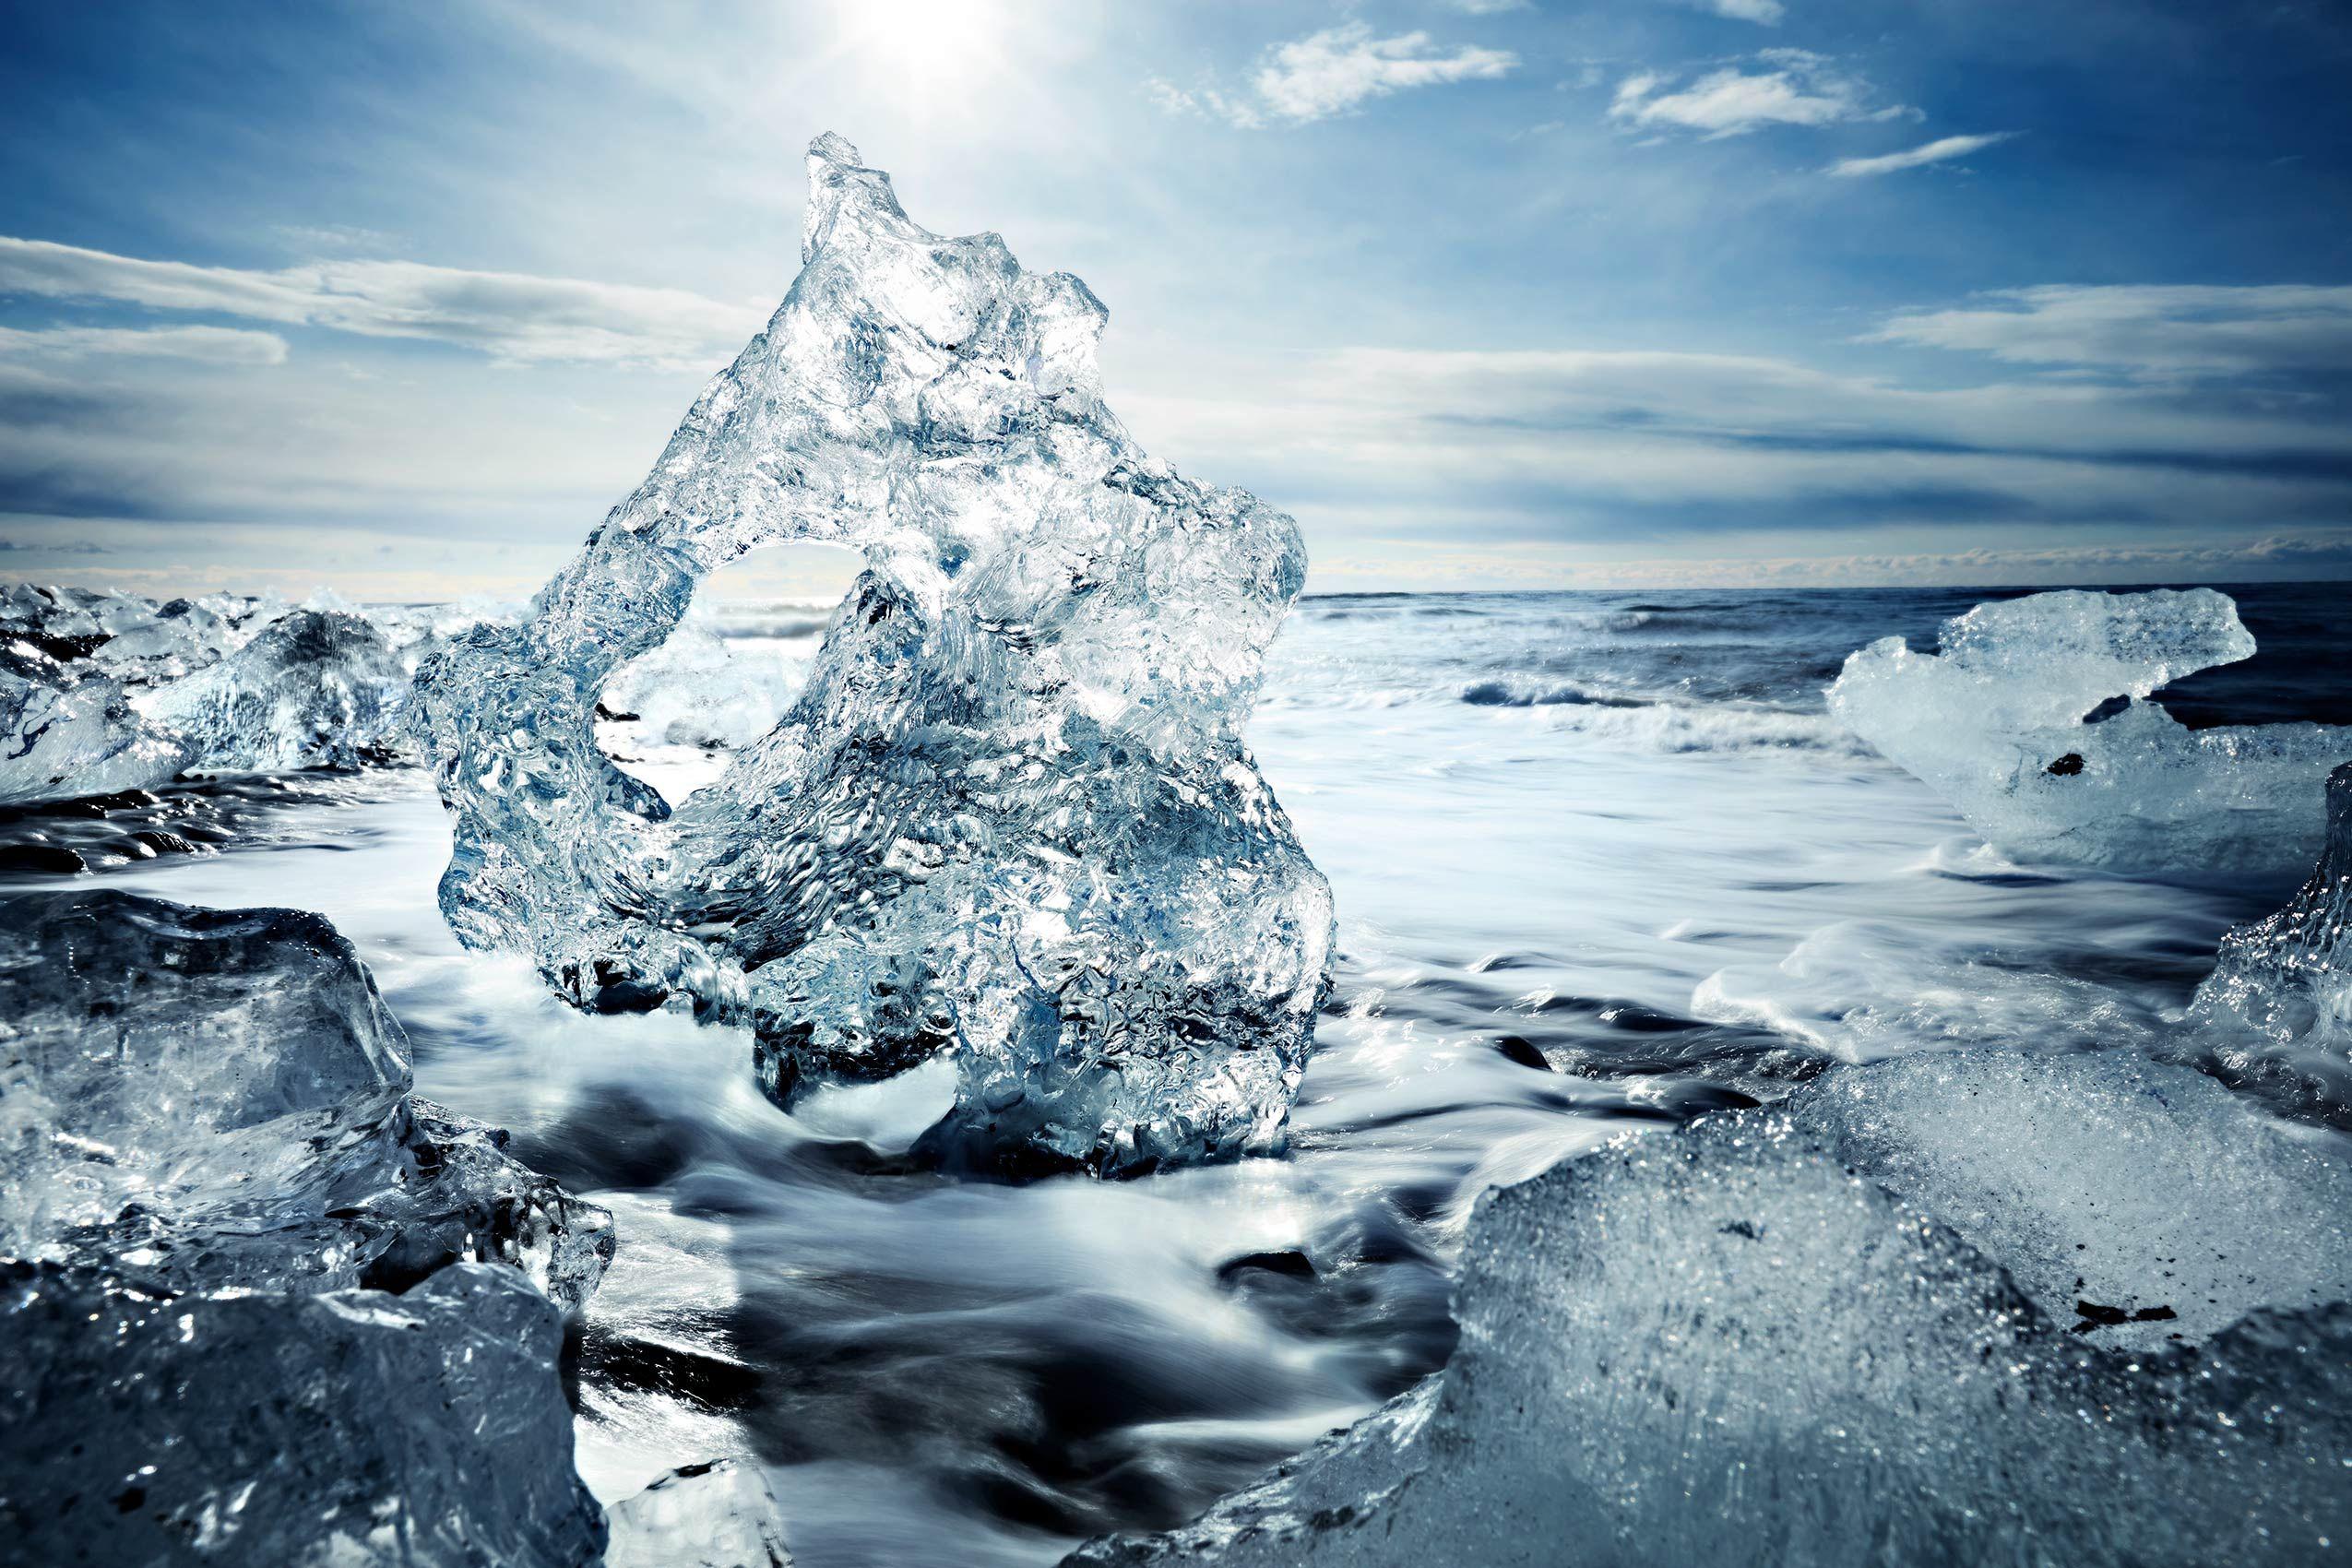 IceLand_1880.jpg